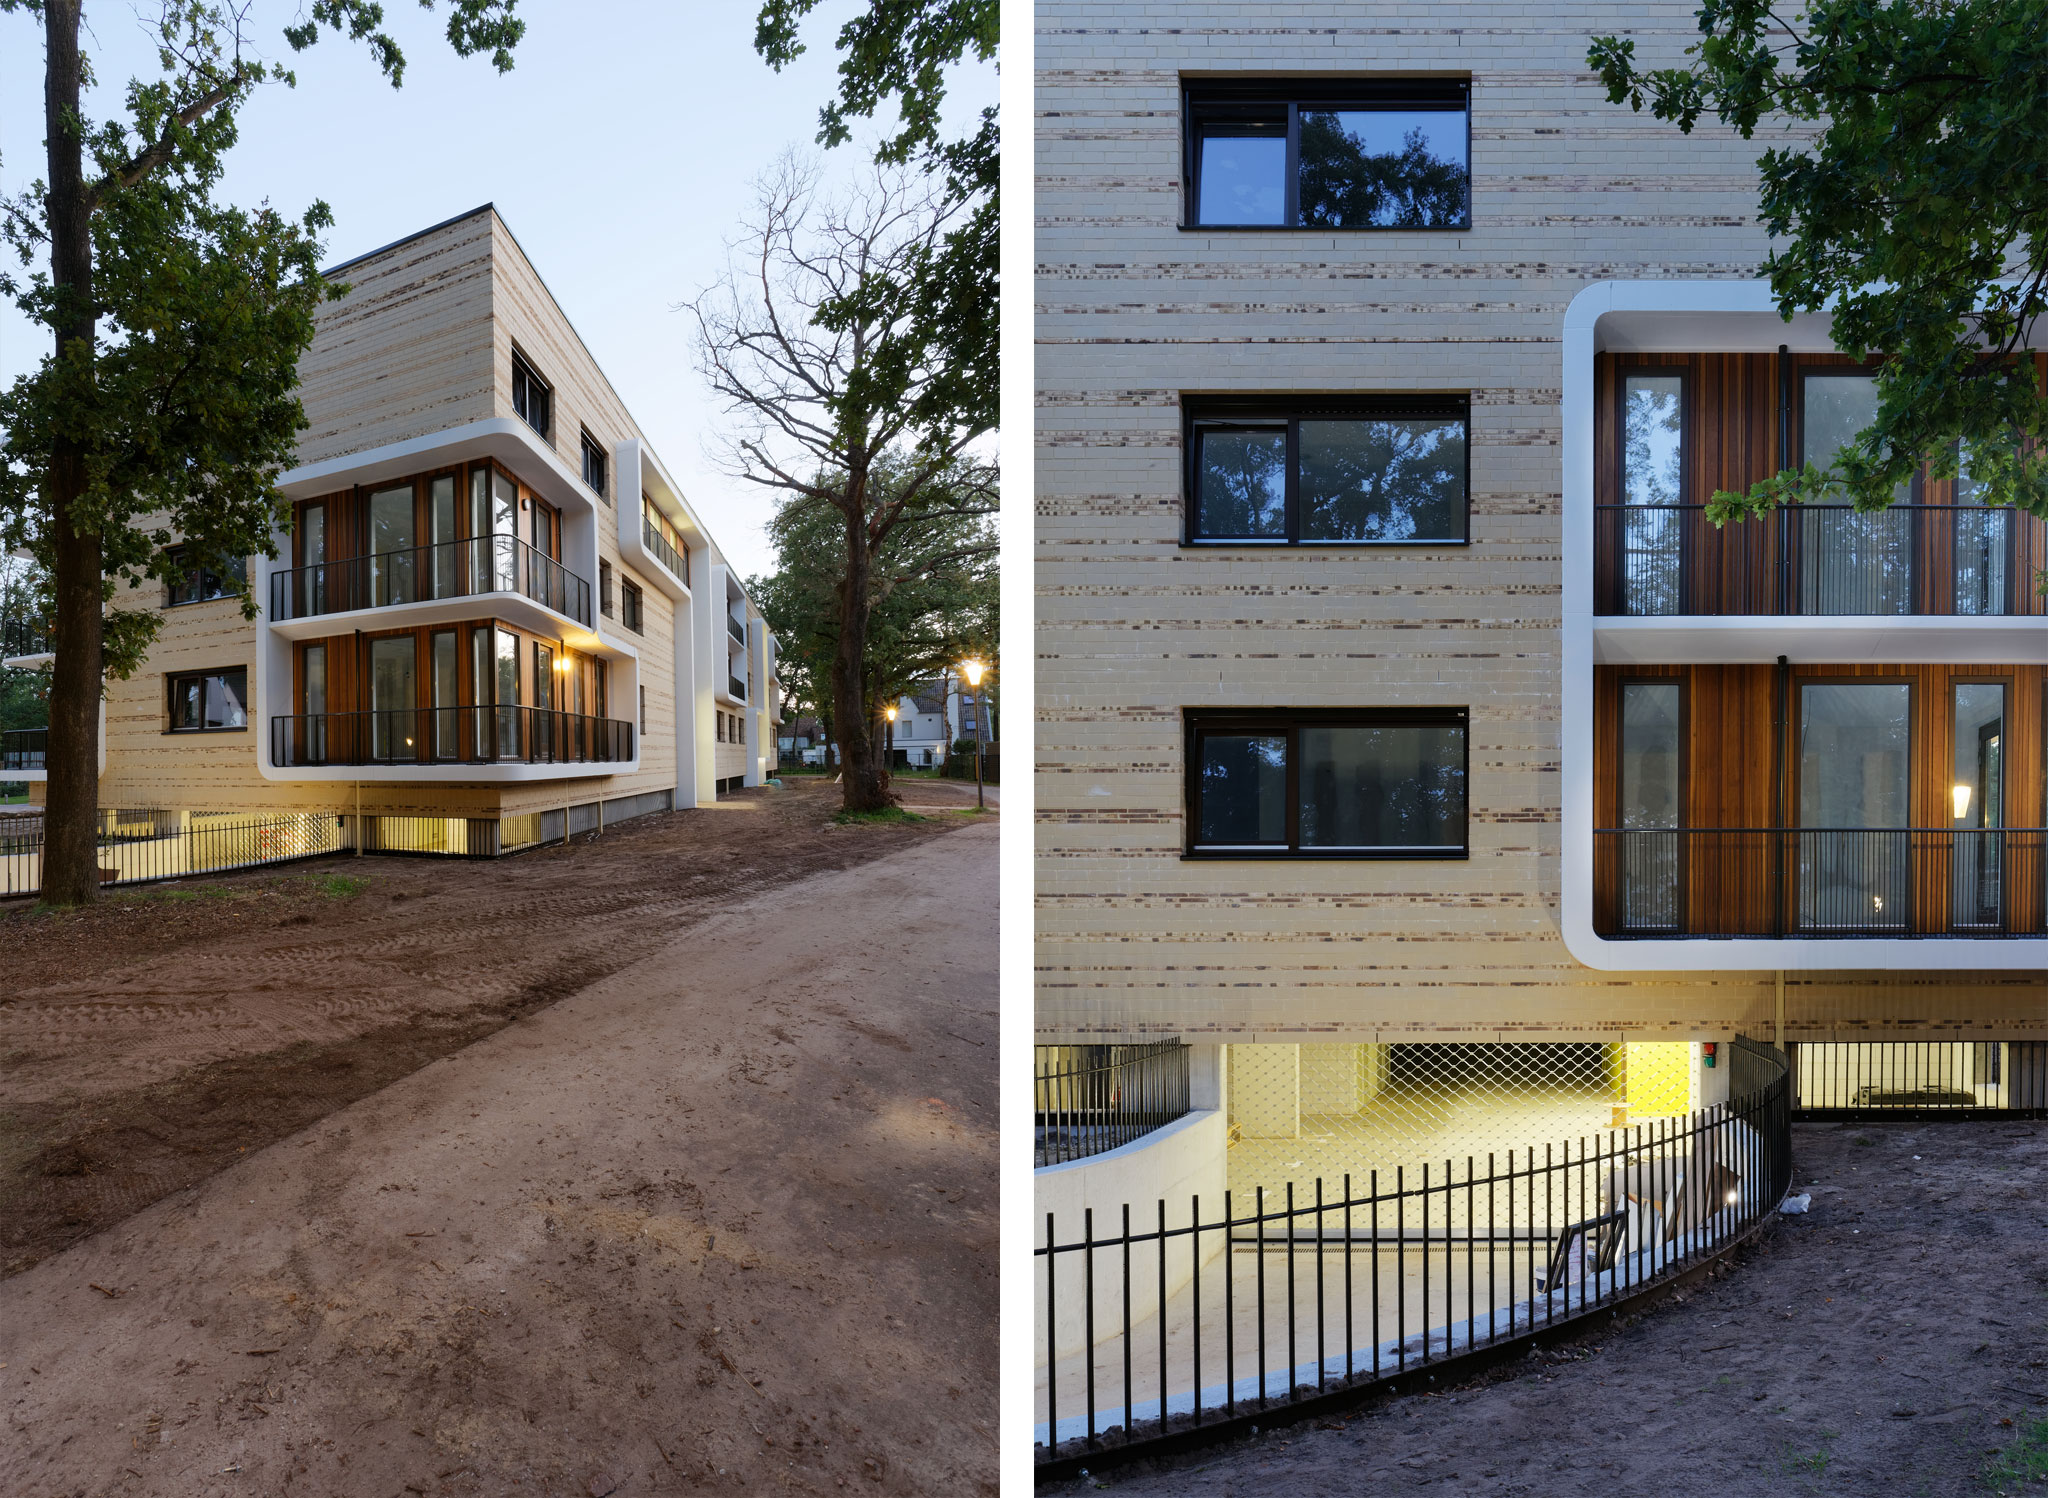 Simone Drost Architecture Planet Lab Architecture Appartementen Stadhouderspark Vught garage